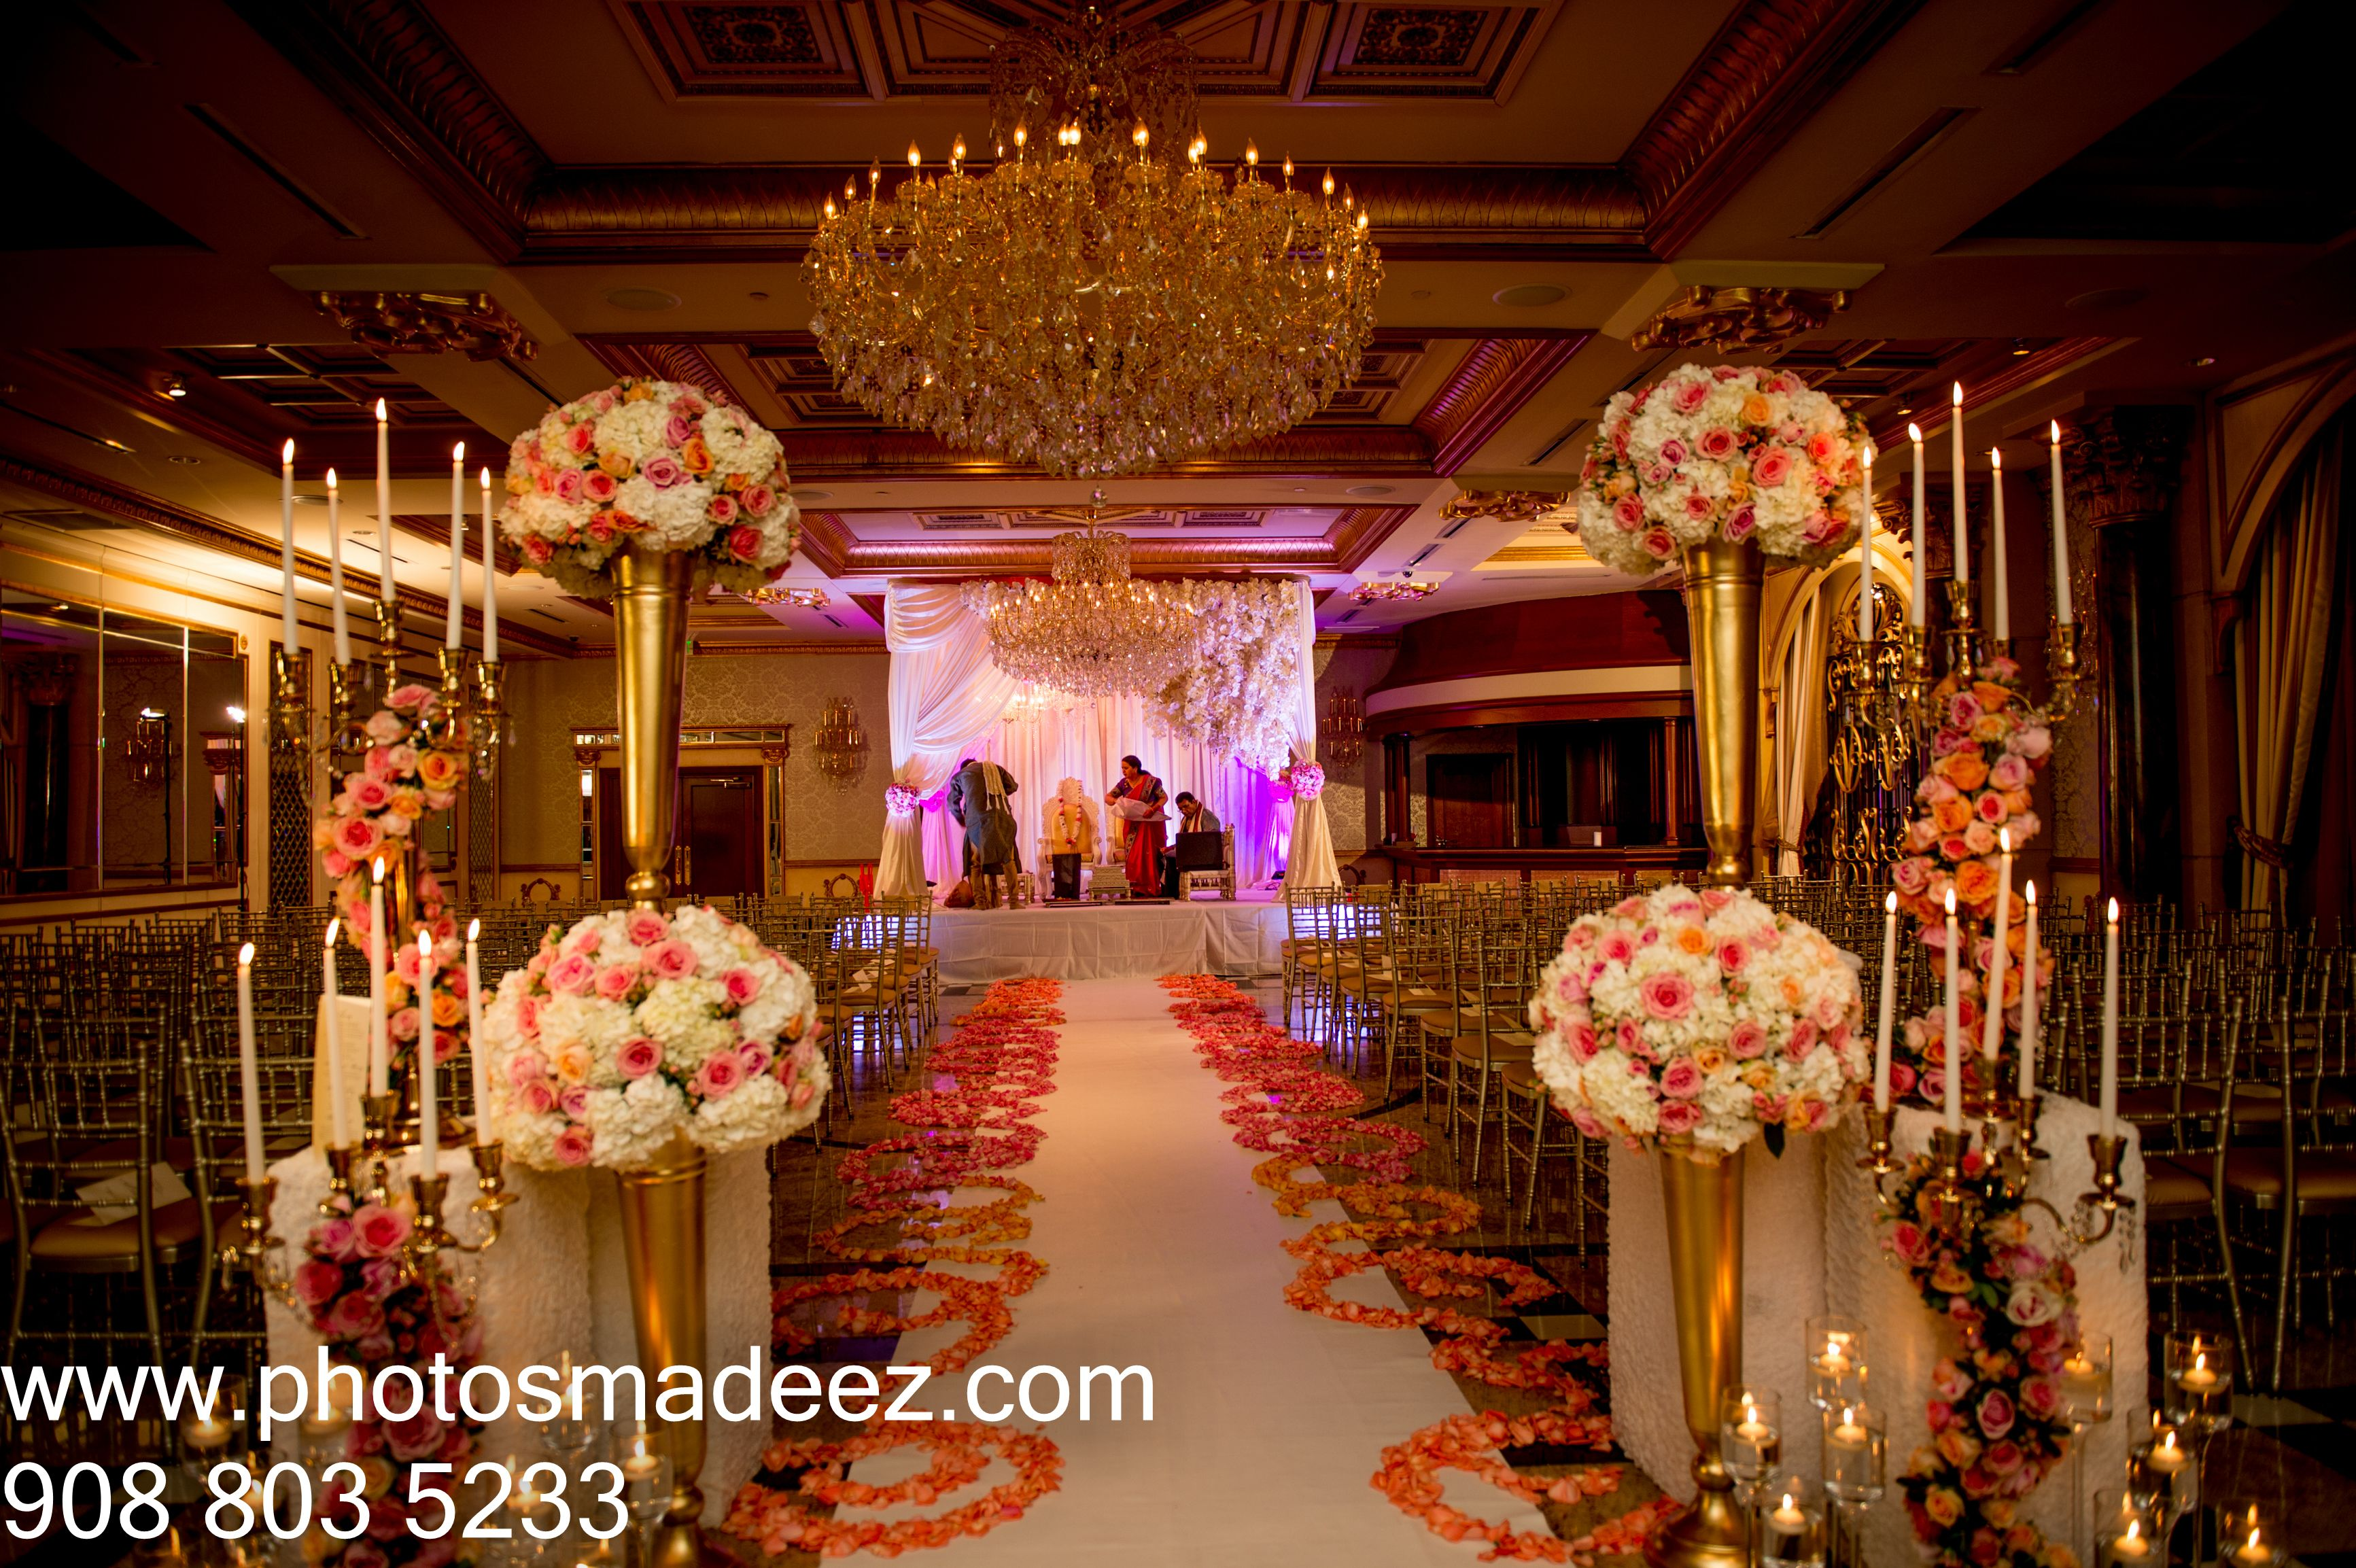 Wedding Reception Decor at The NJ Indian